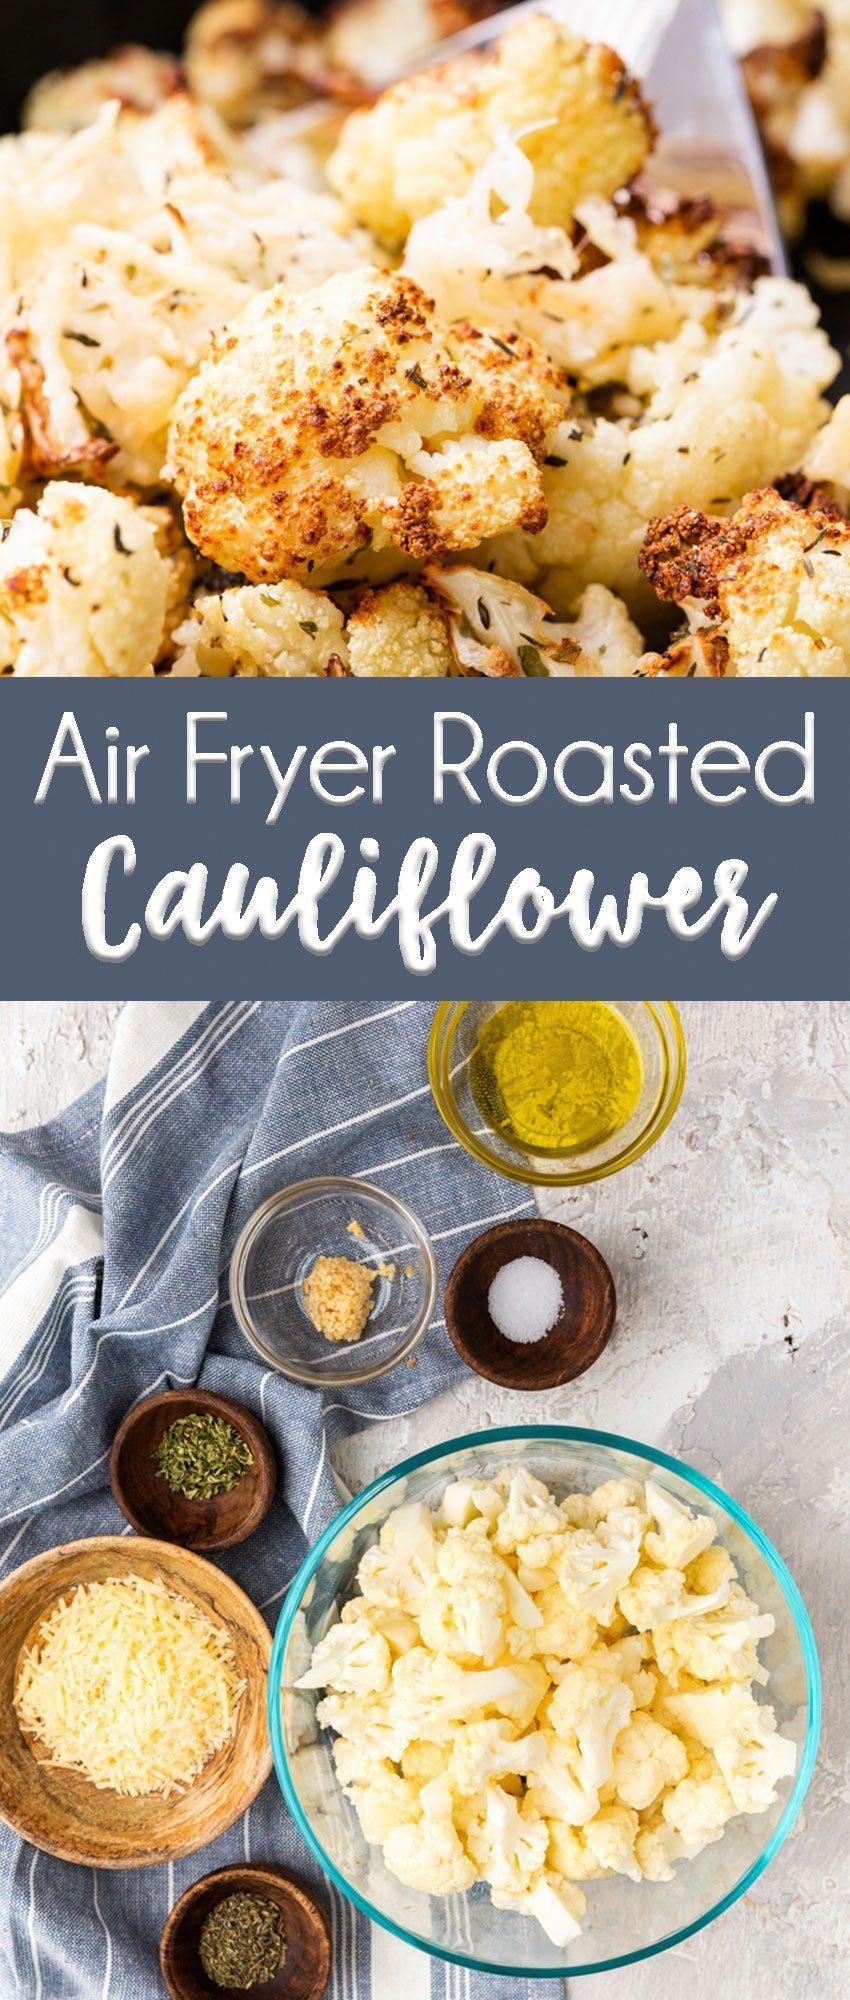 Air fryer roasted cauliflower. Yum. Forgot parmesan cheese but still tasted great.